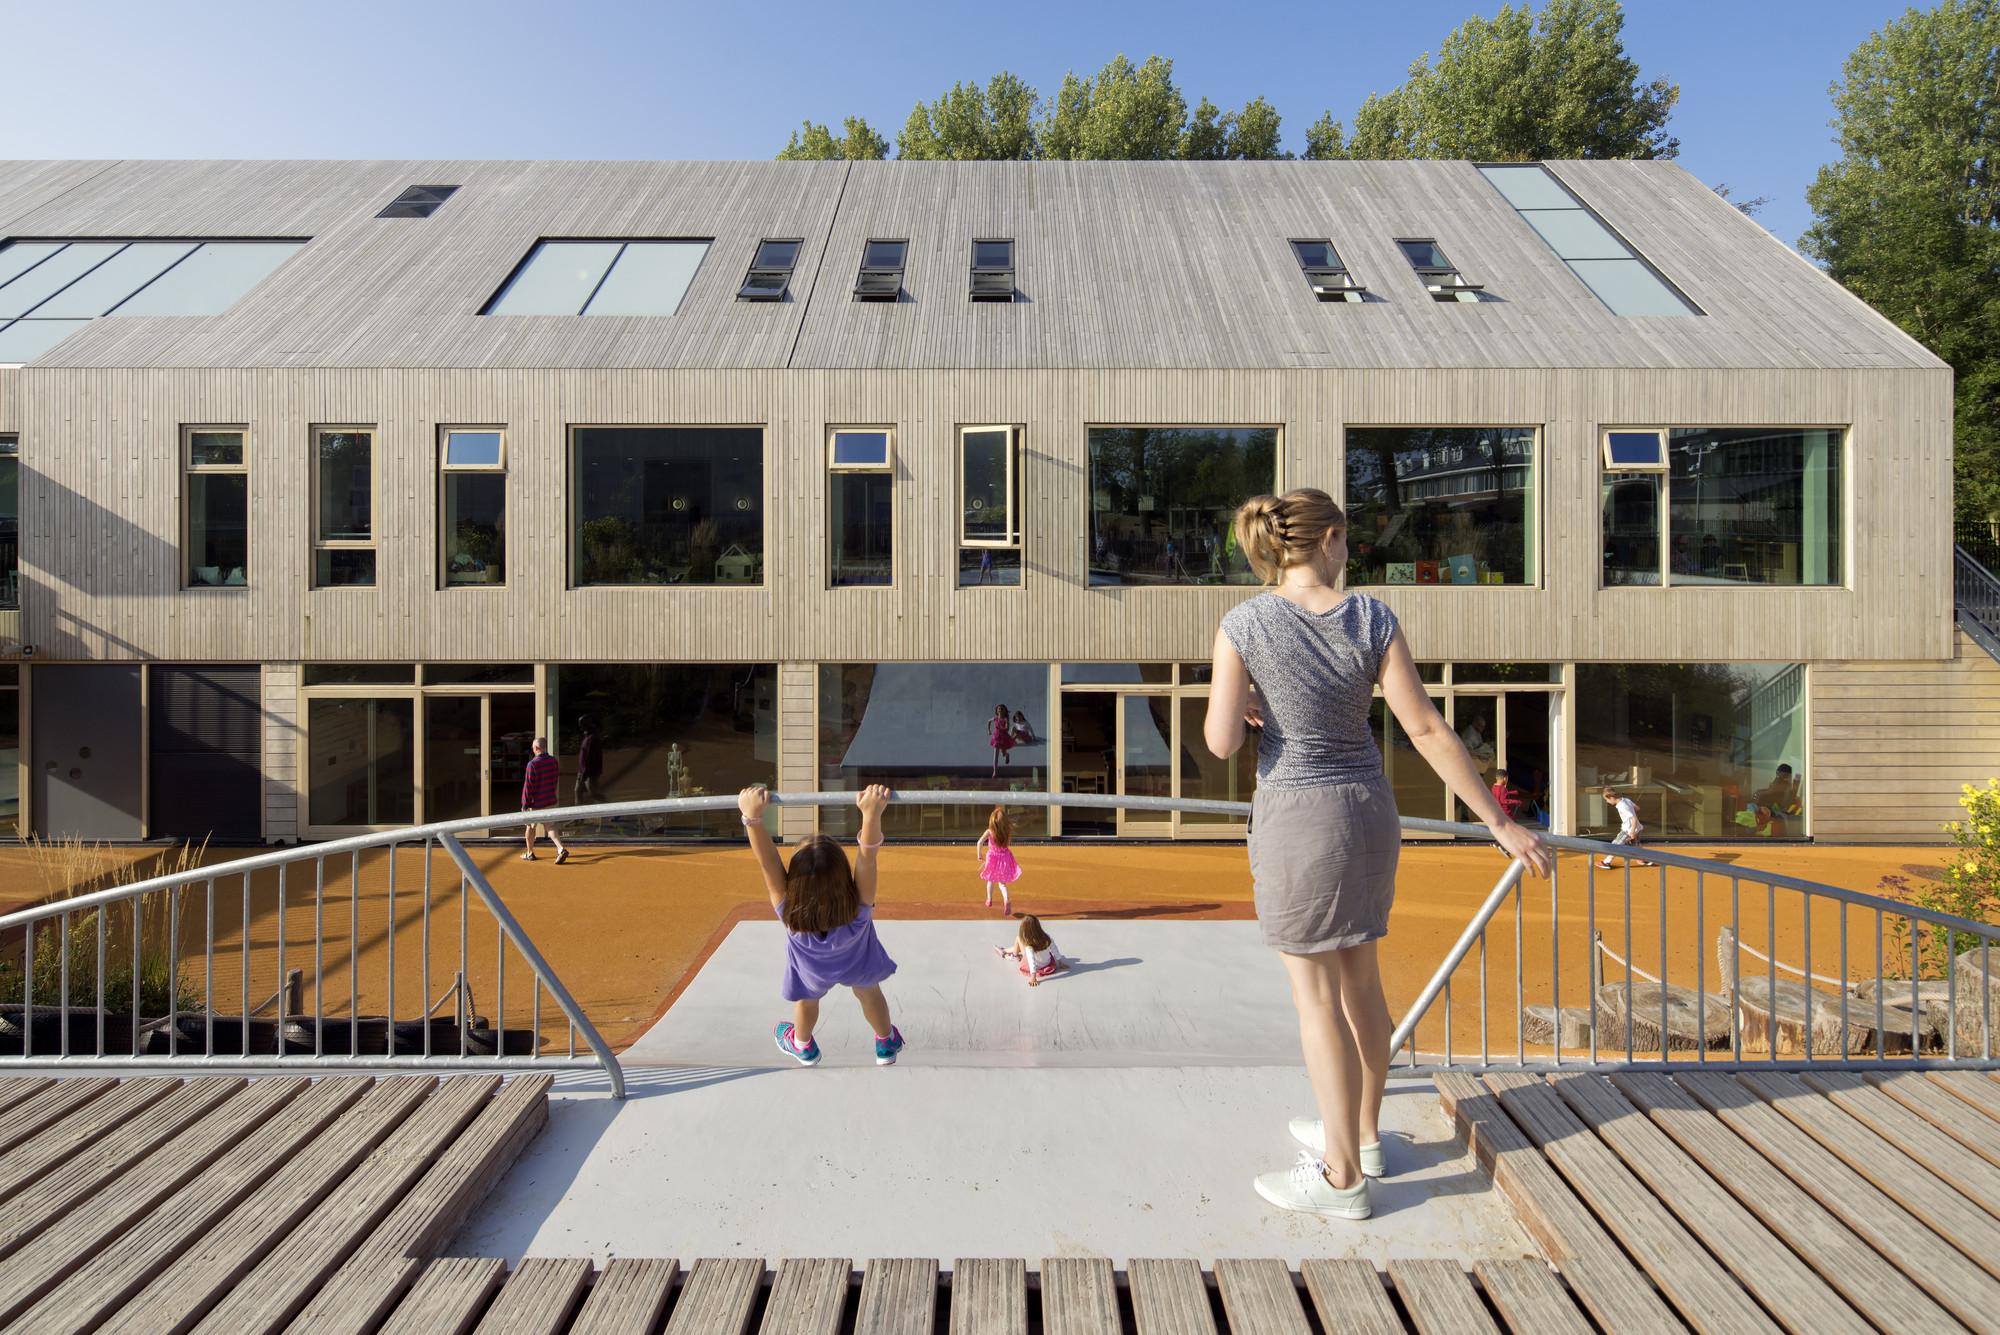 Expansion of the American School of the Hague / Kraaijvanger, © Ronald Tilleman